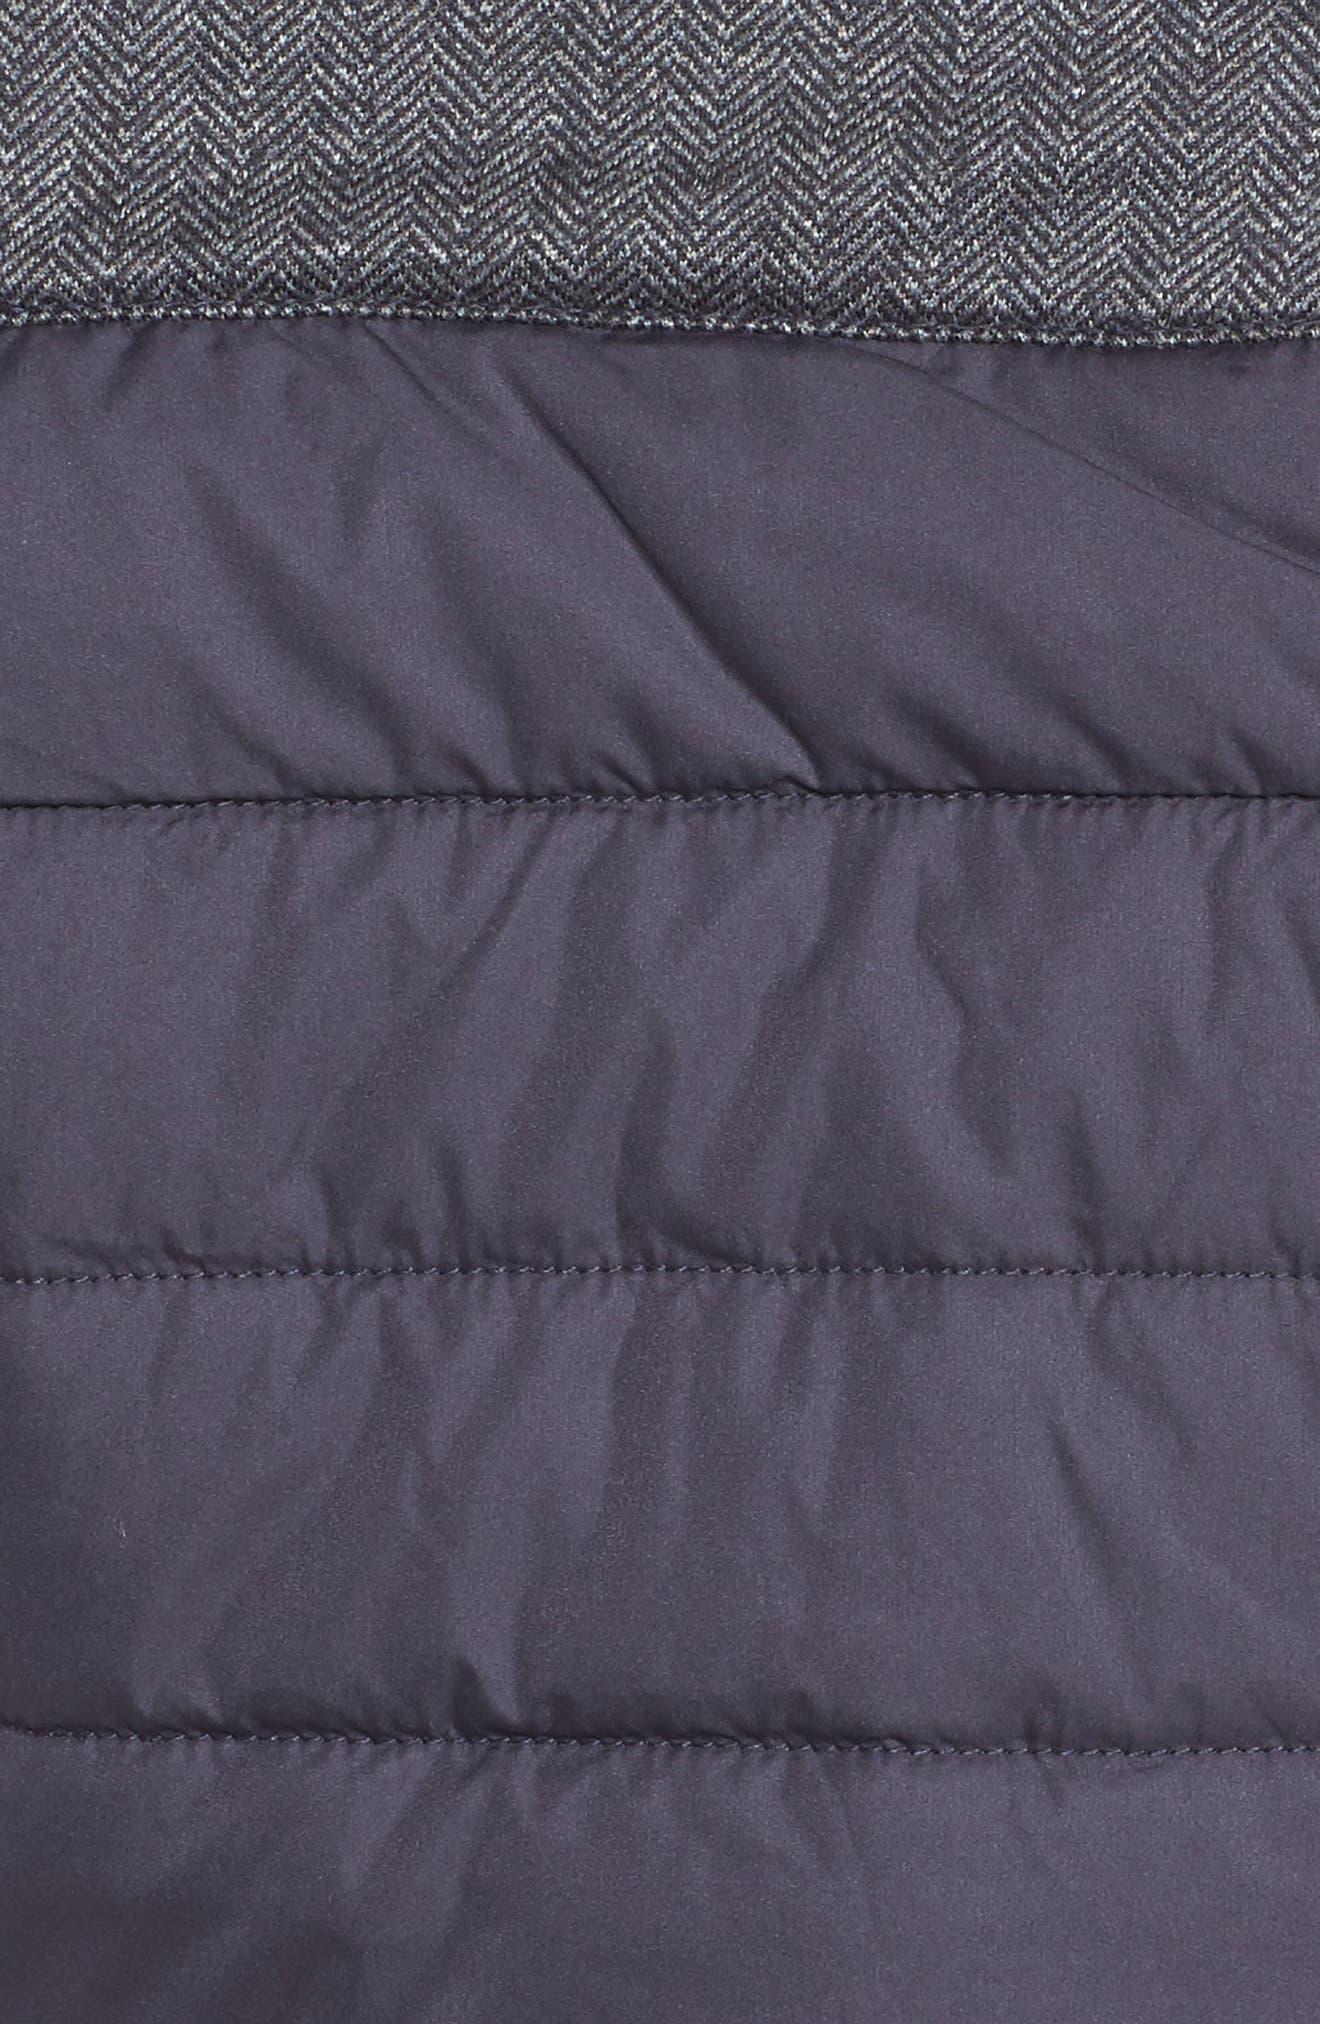 HellyHansen 'Astra' Jacket,                             Alternate thumbnail 6, color,                             Graphite Blue